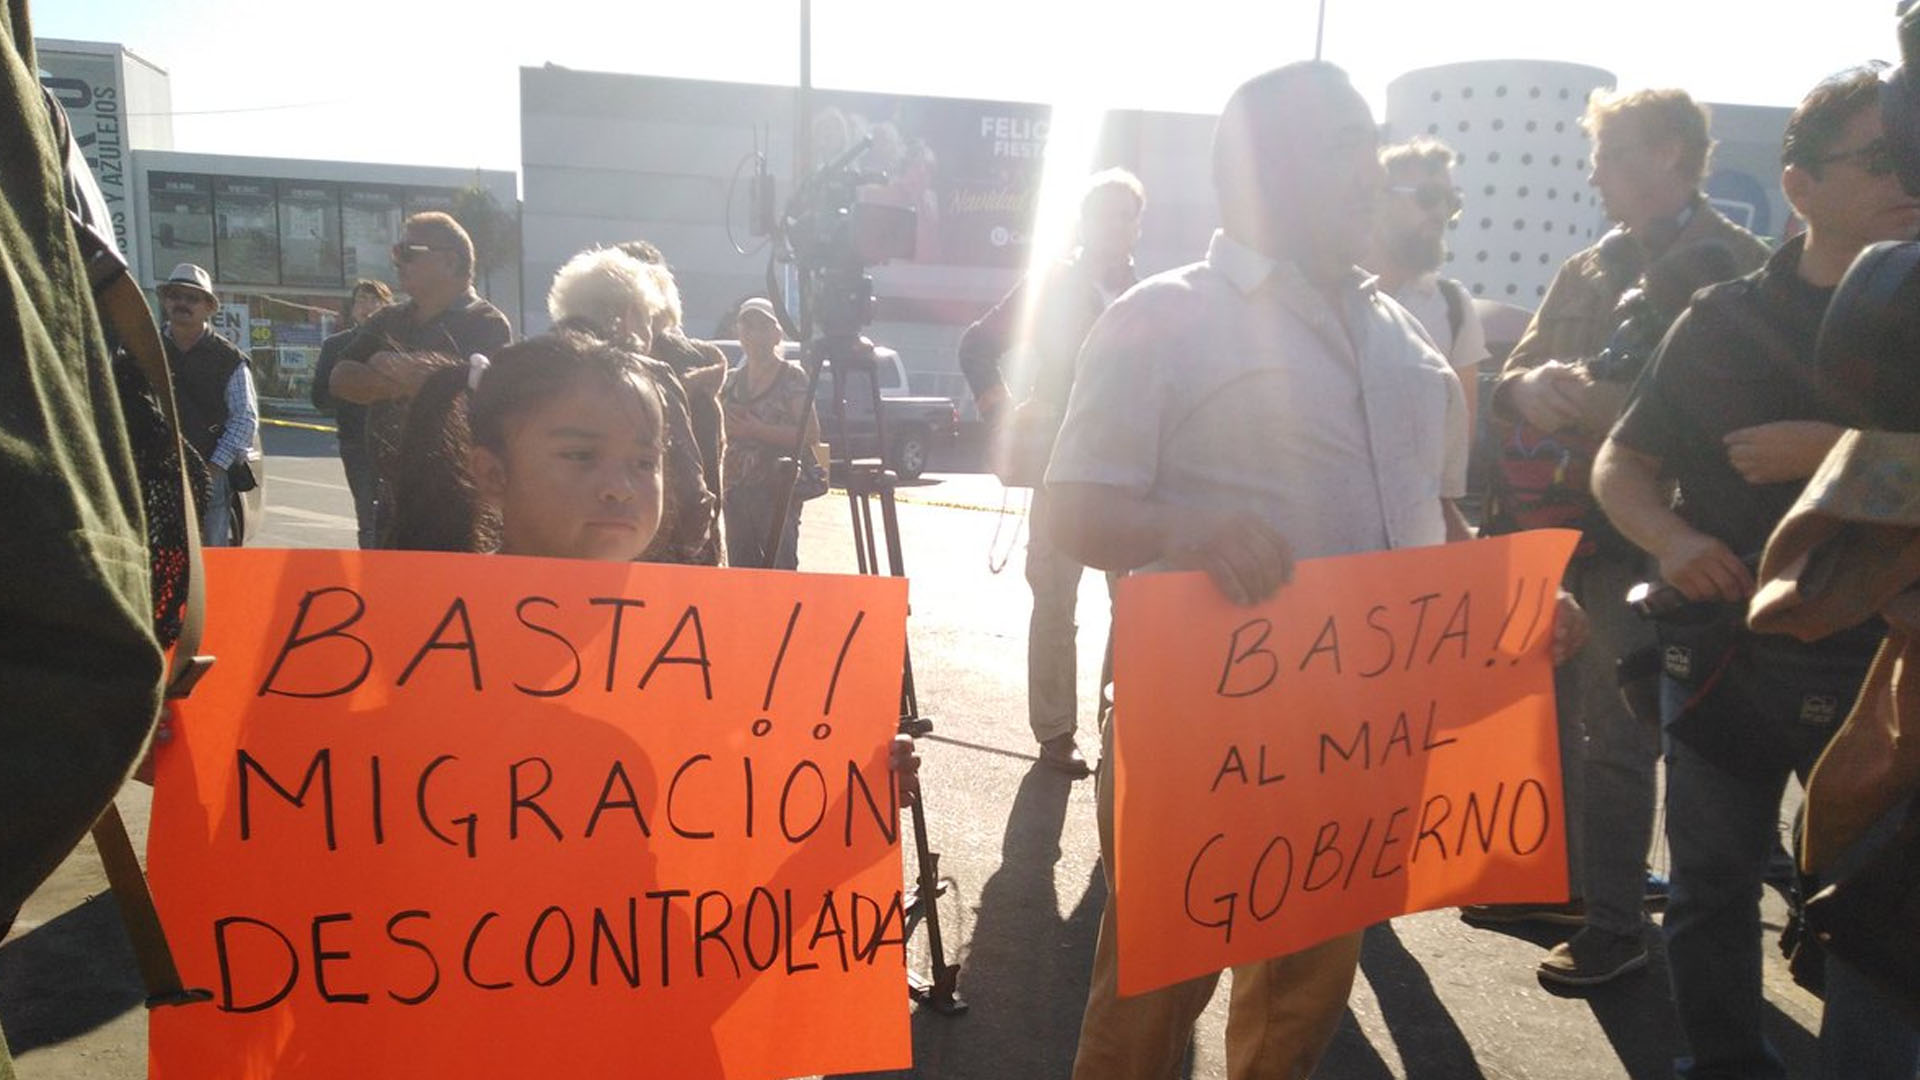 Los tijuanenses que rechazan la llegada masiva de centroamericanos. (Foto: @KaeuferTobias)